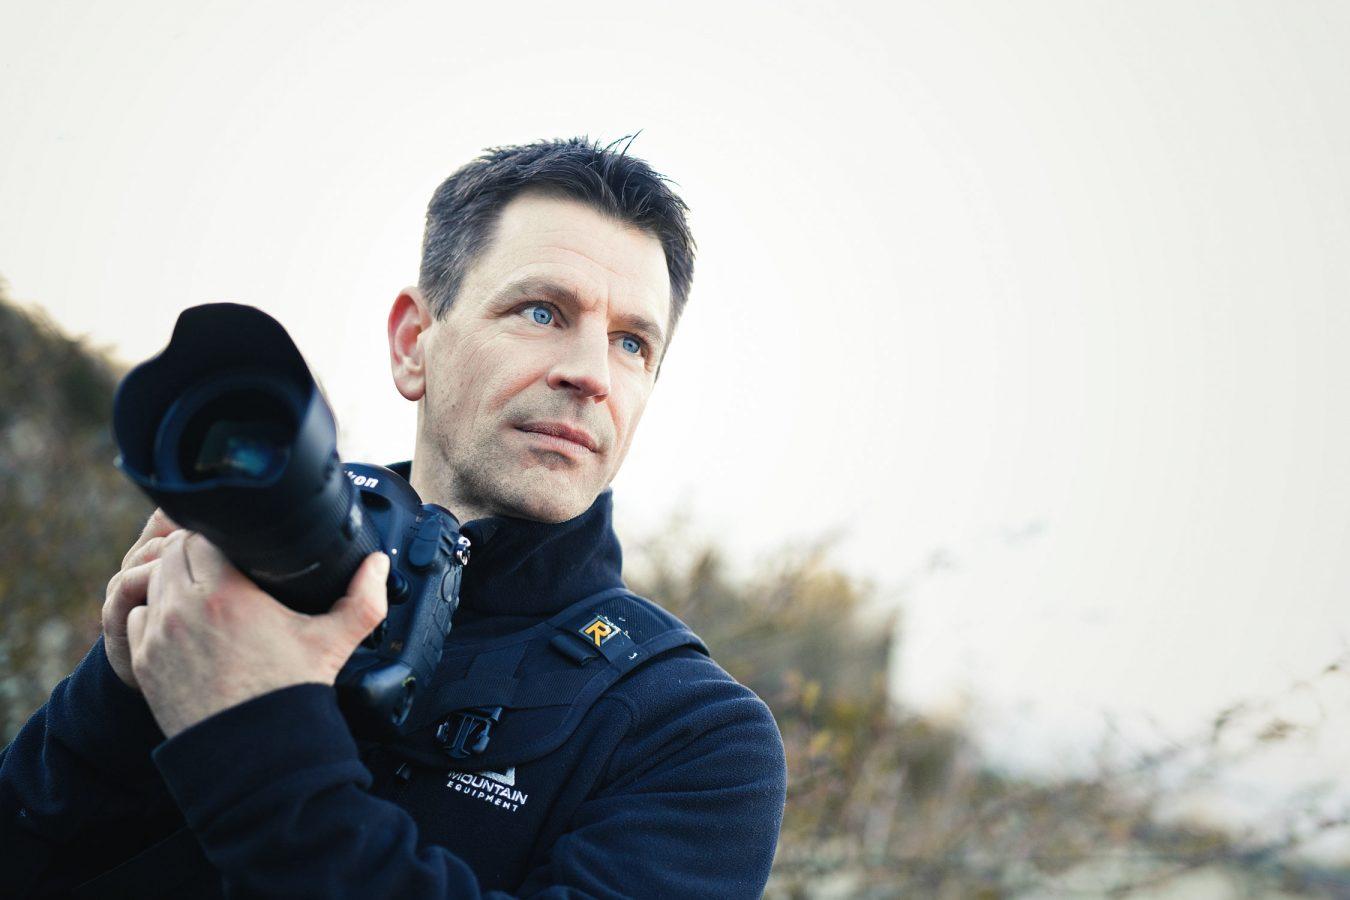 lifestyle-wilderness-action-photographer-cambridge